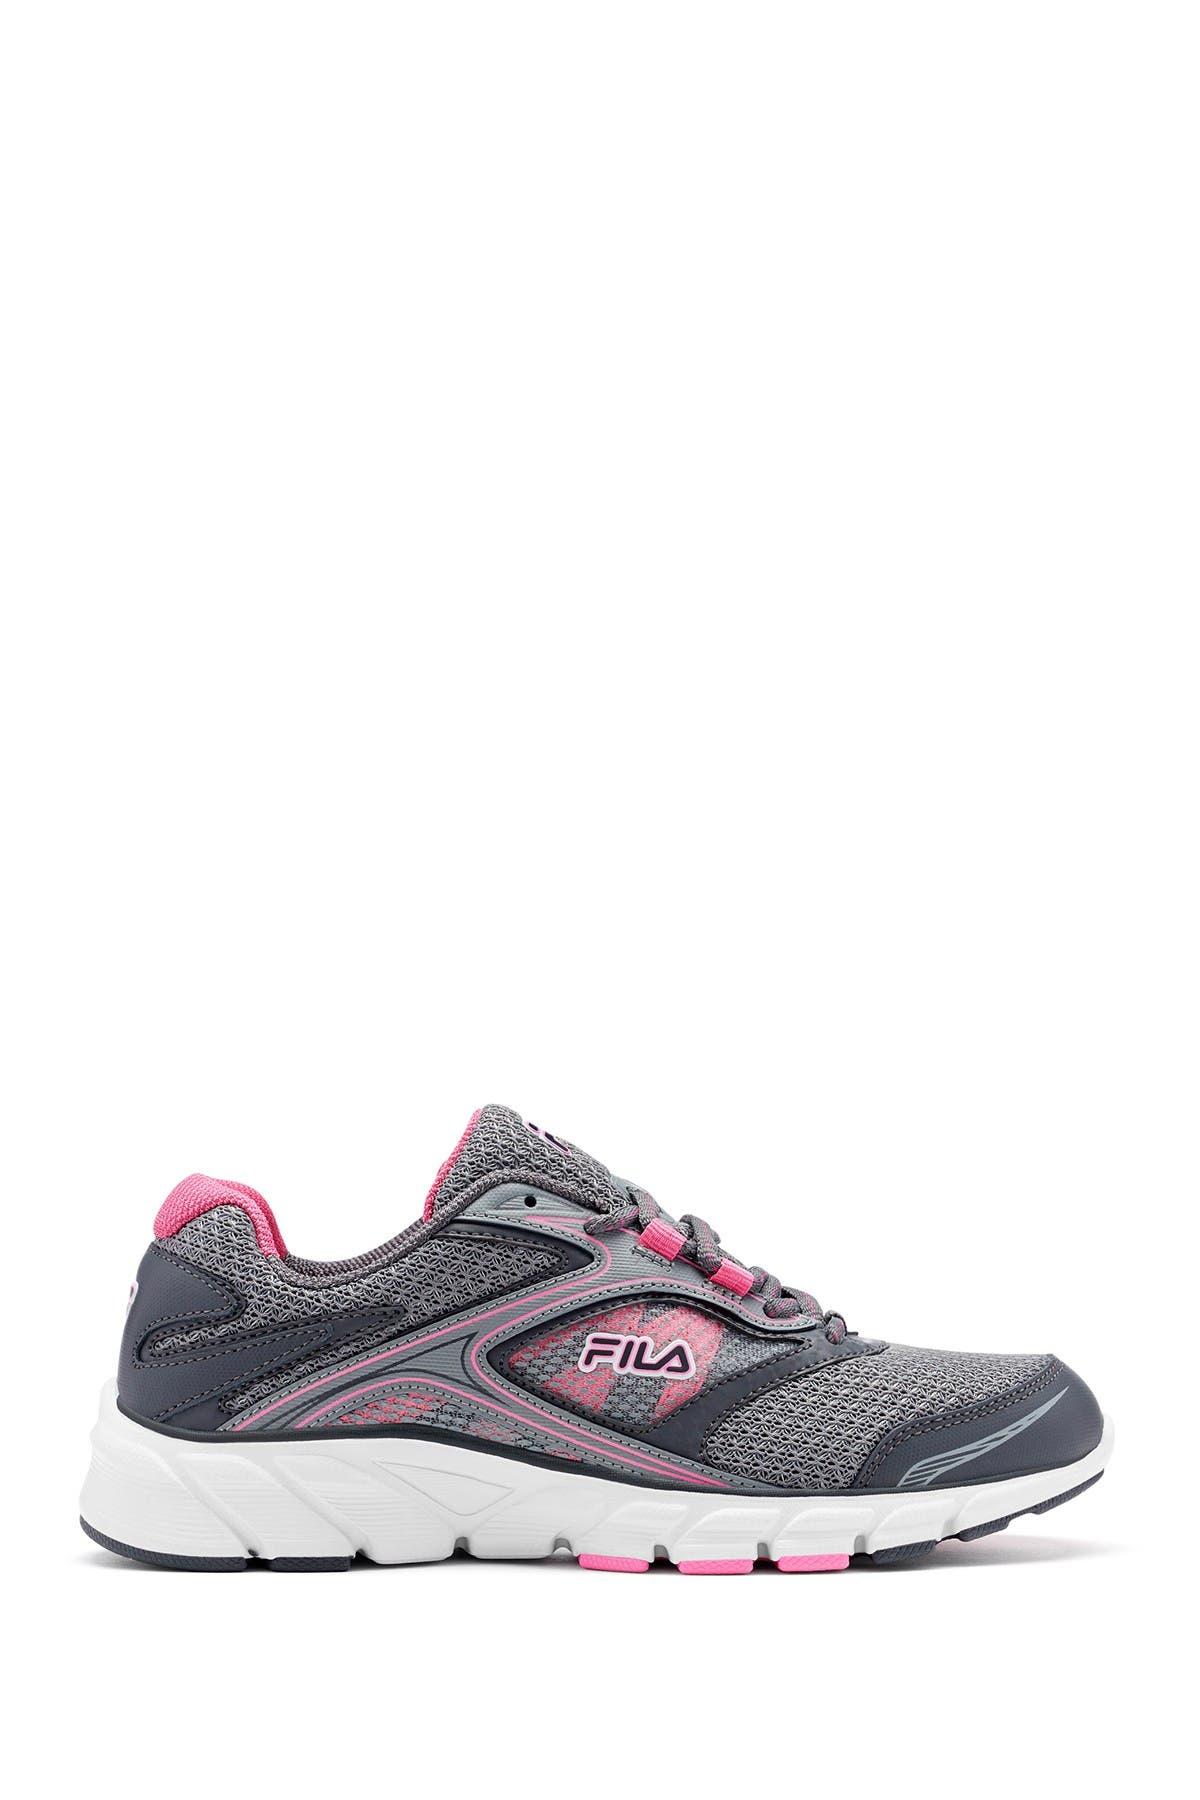 Image of FILA USA Stir Up Sneaker